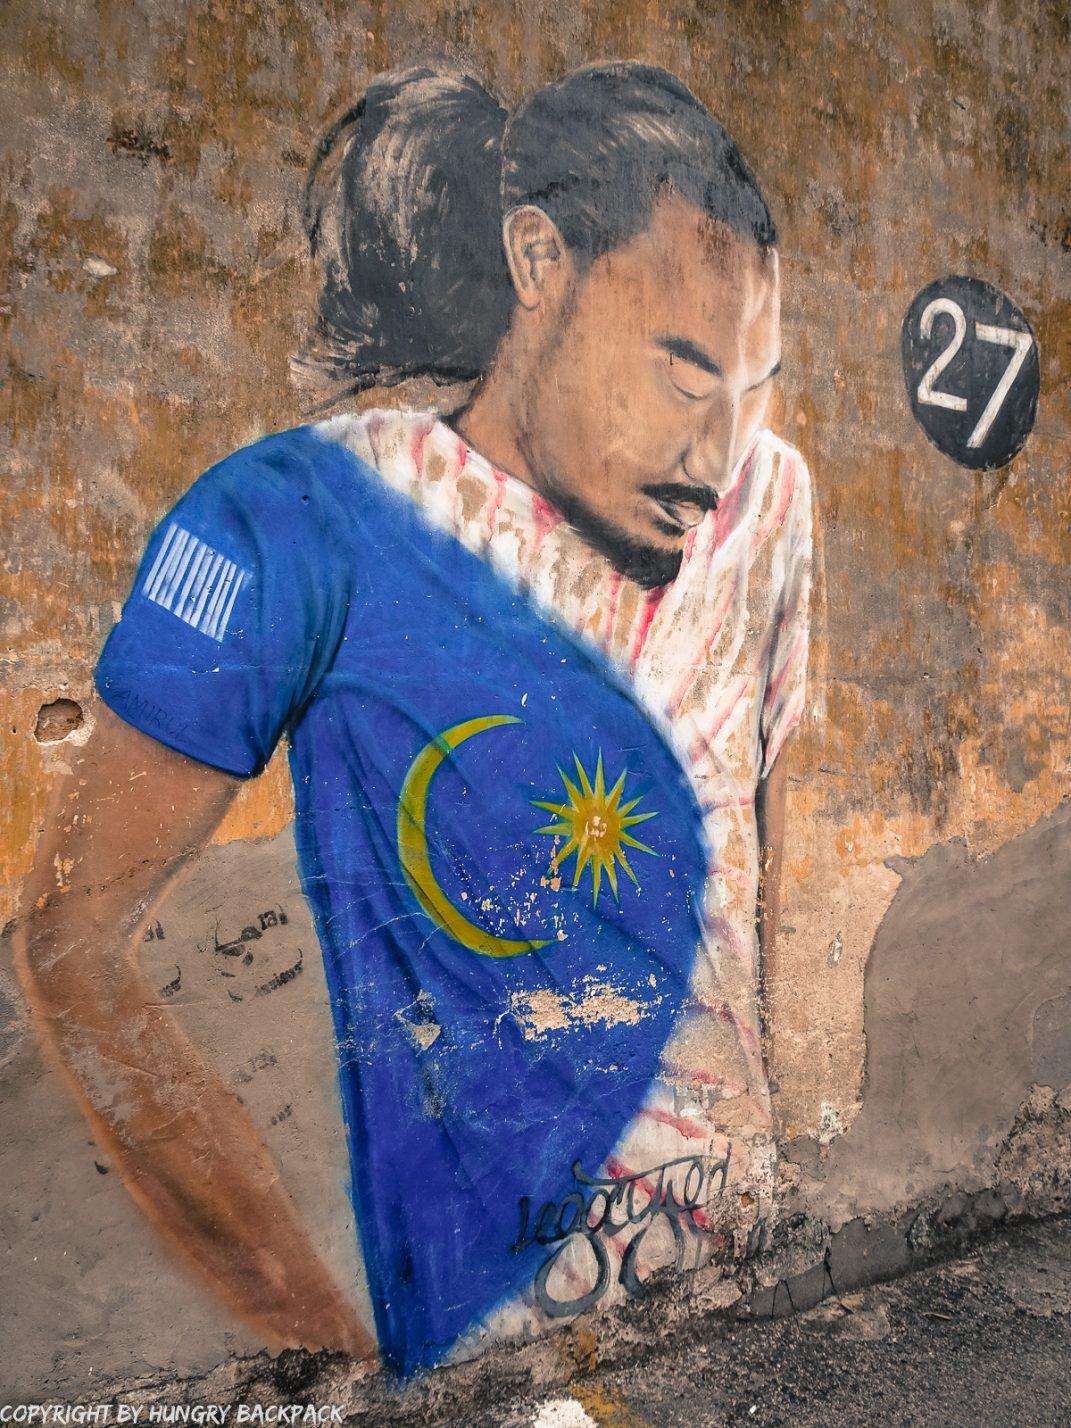 man with flag_street art mural Penang